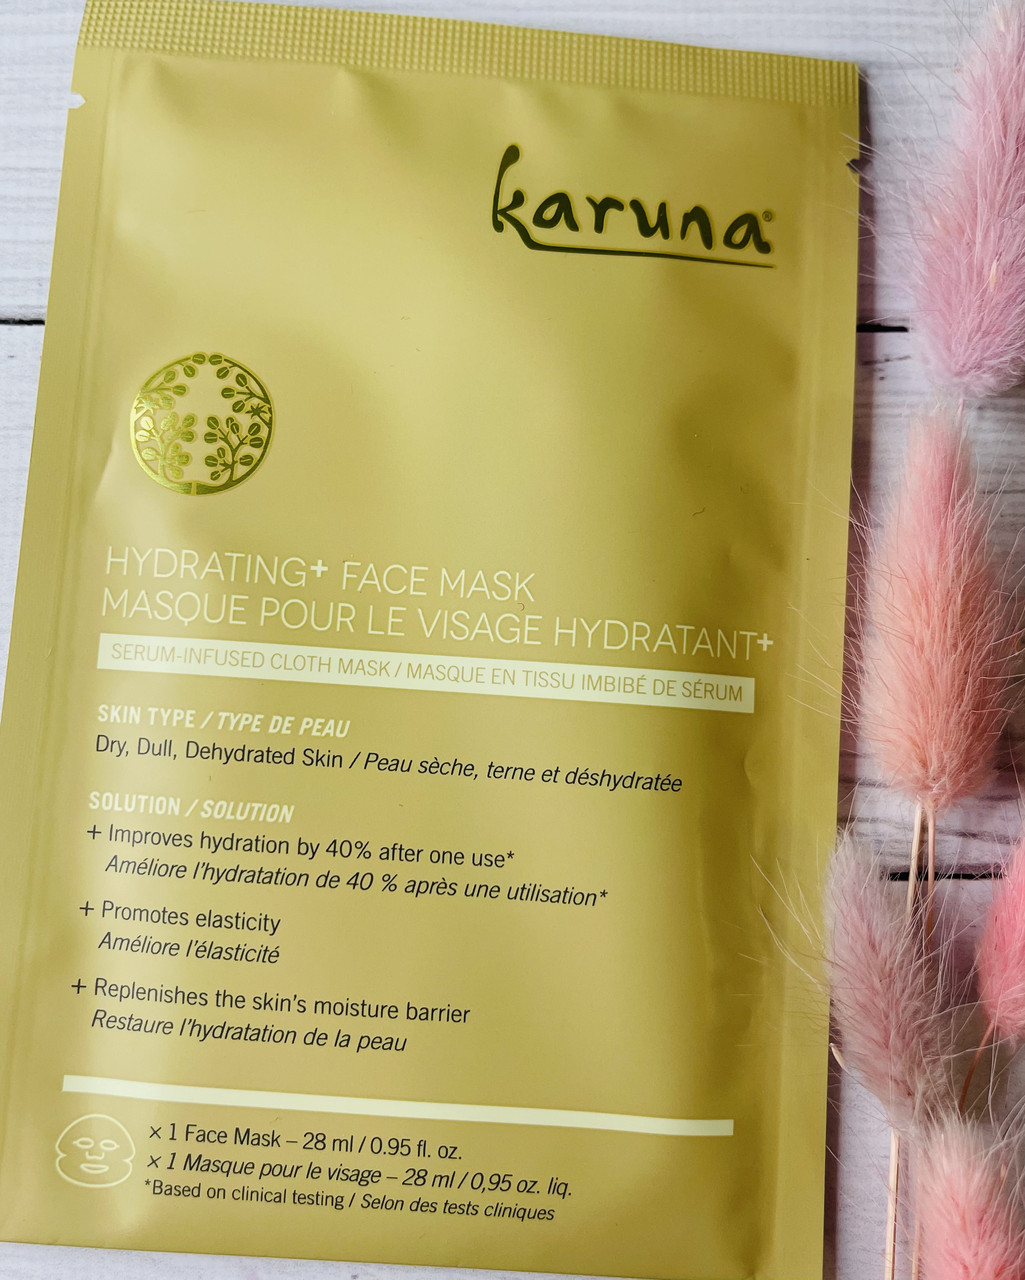 Тканевая увлажняющая маска для кожи лица KARUNA Hydrating Face Mask